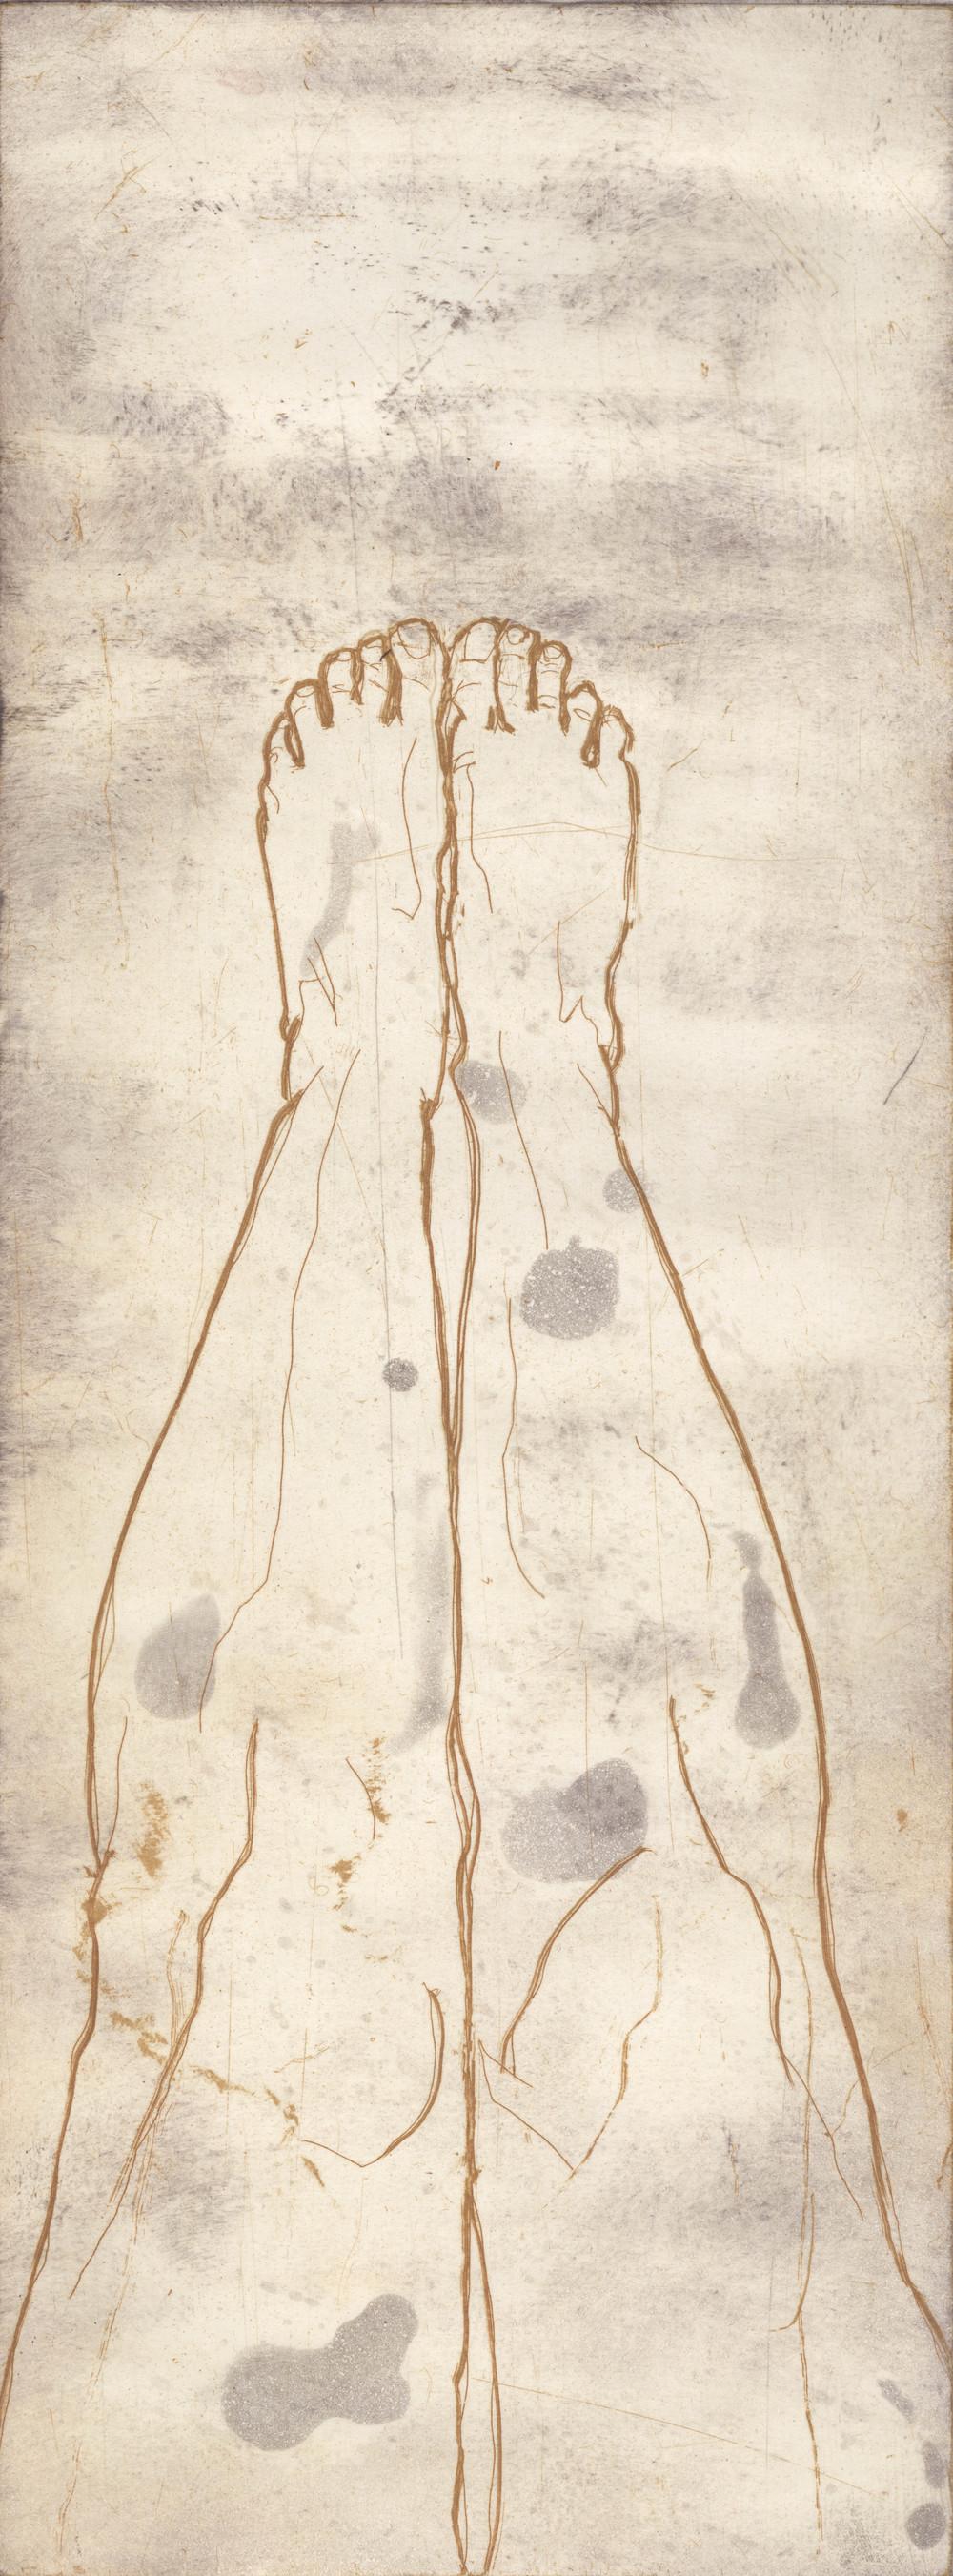 """Bruised"" 2012"